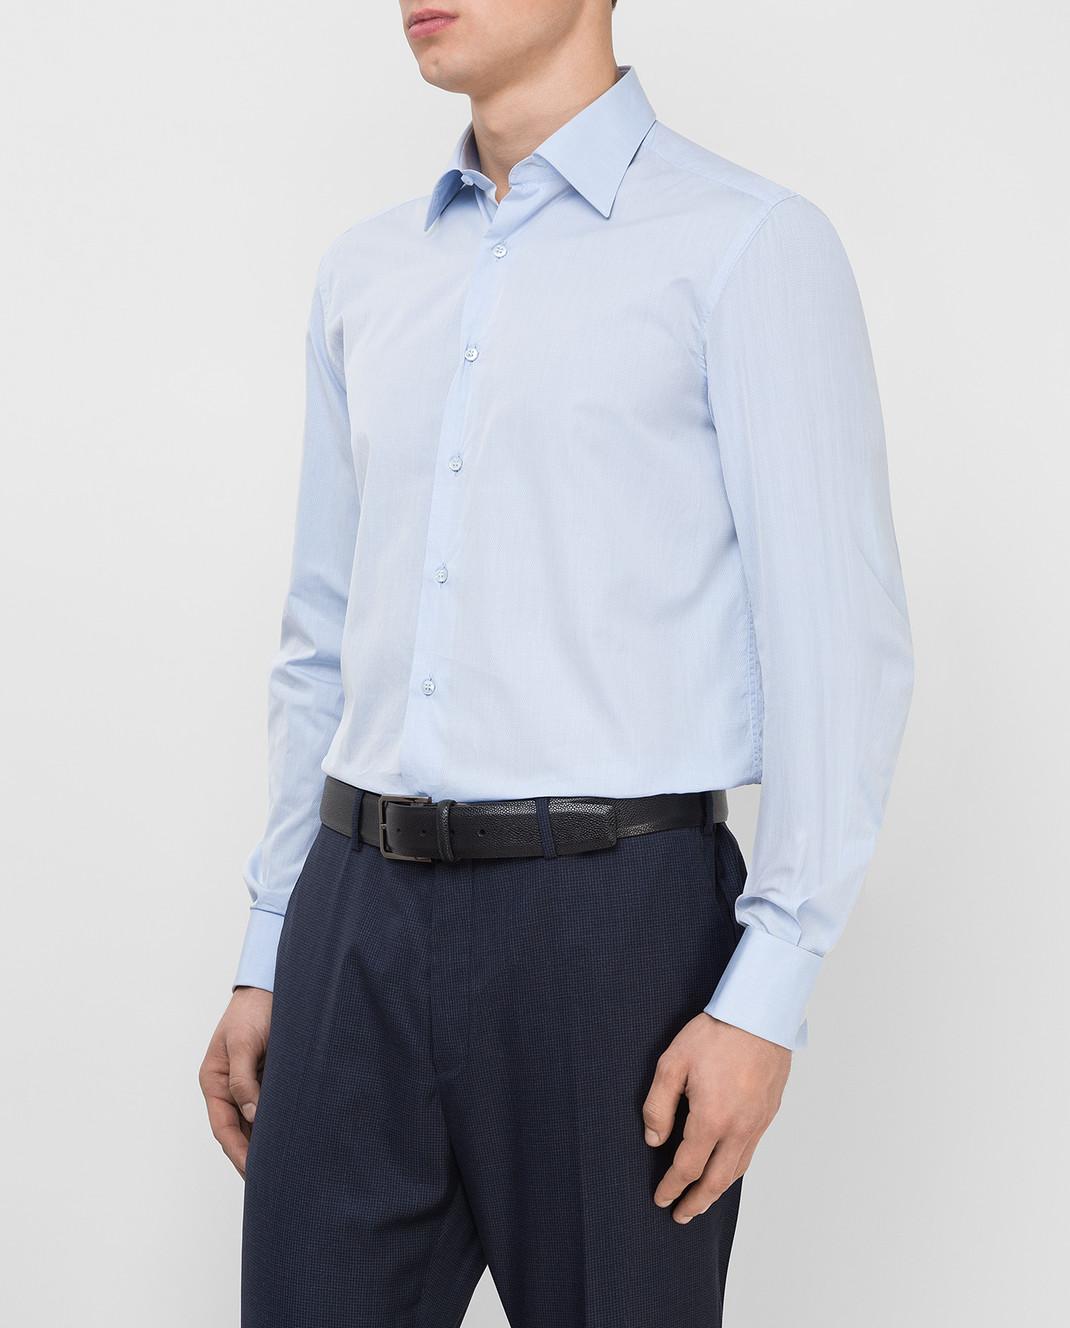 Stefano Ricci Голубая рубашка MC000591L1601 изображение 3